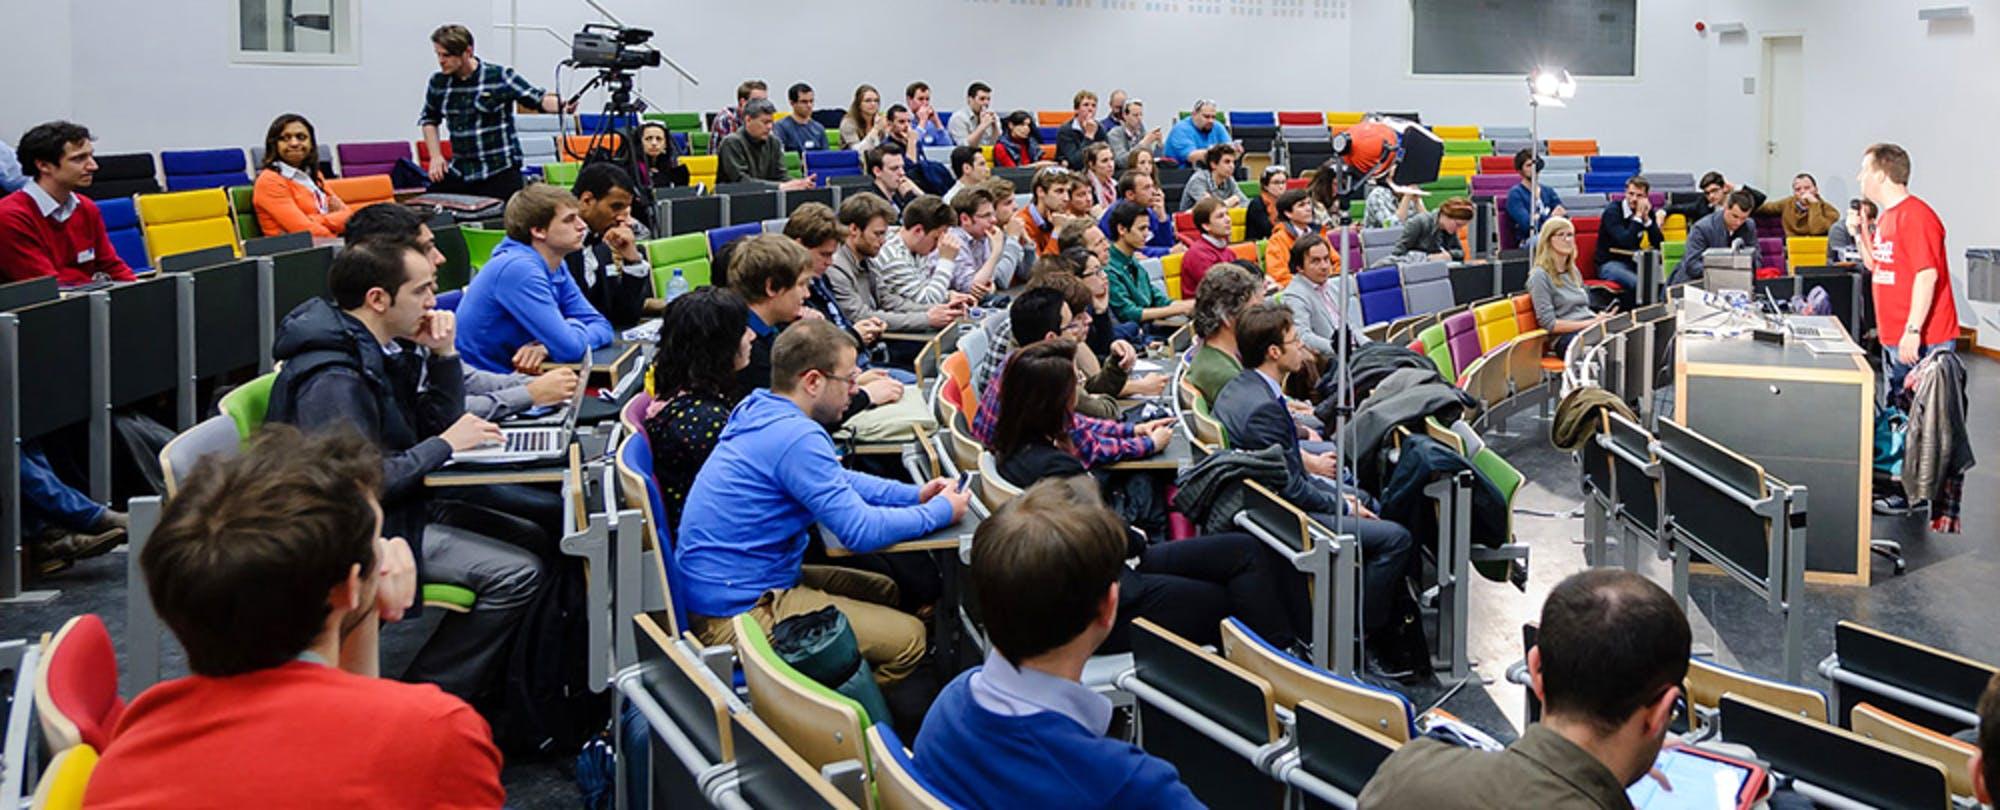 EdSurge Partners with UP Global's Startup Education Program